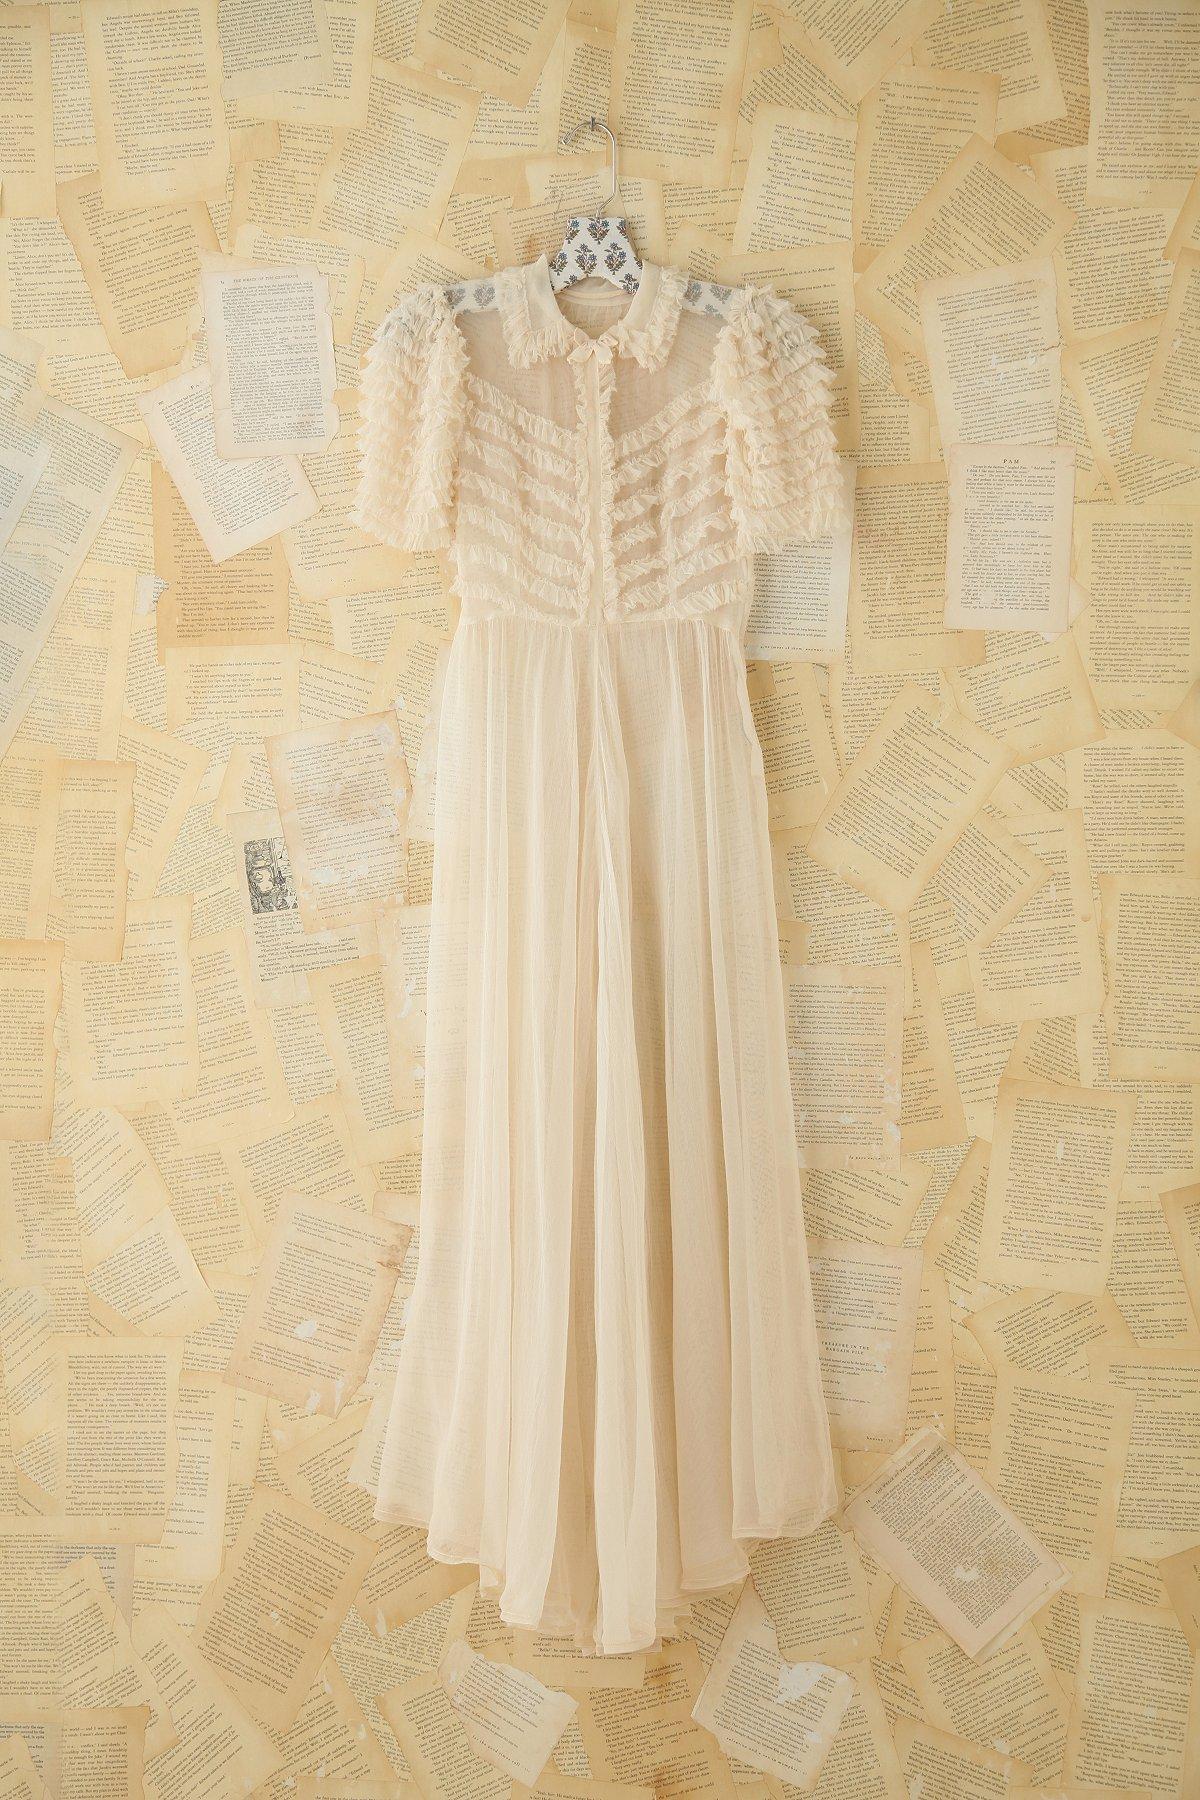 Vintage Sheer Ruffled Maxi Dress